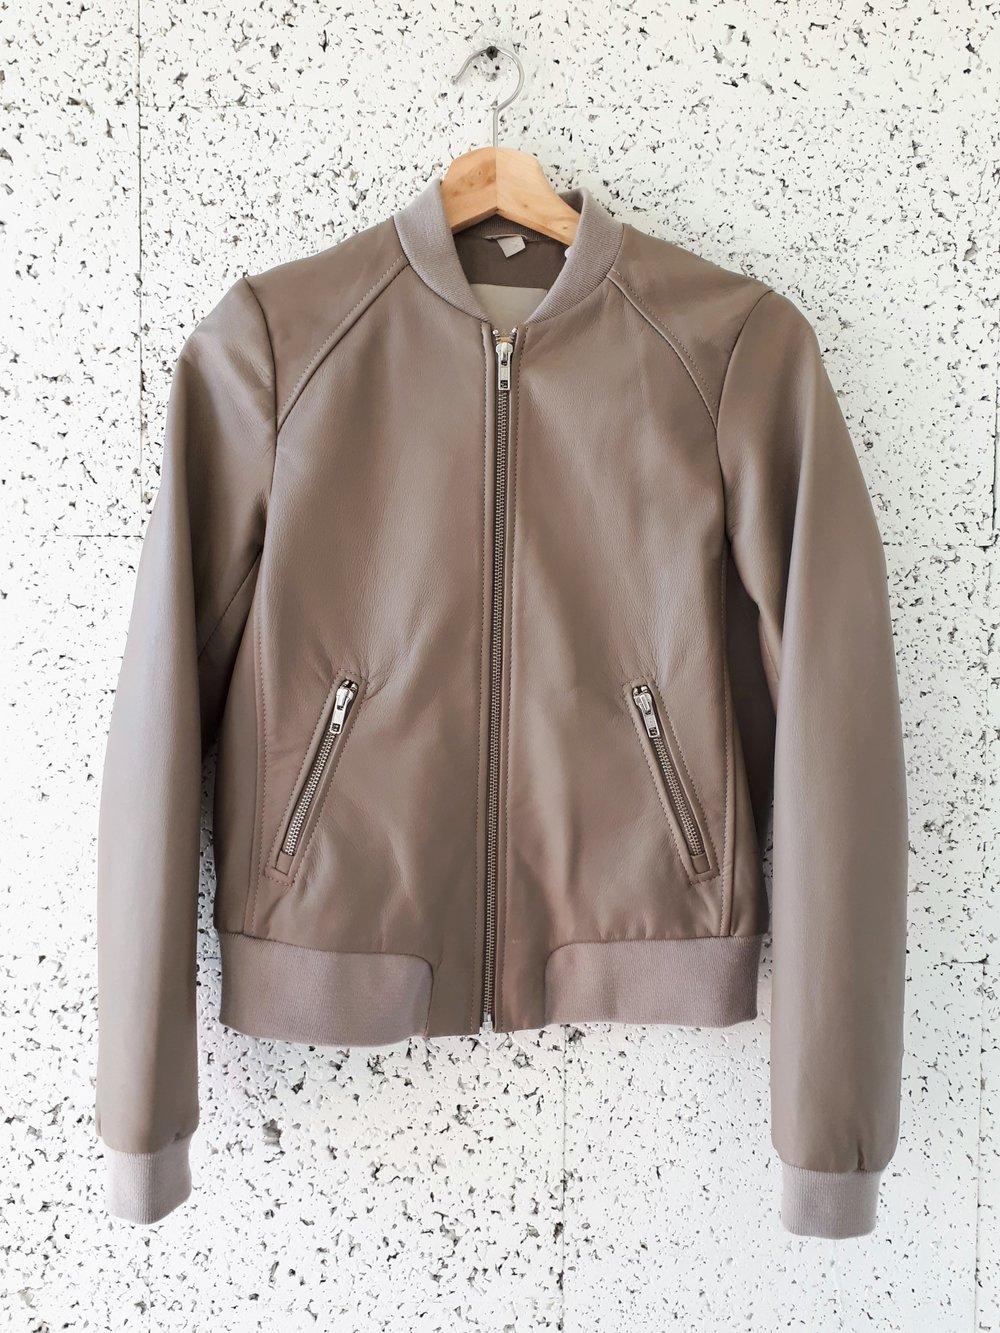 Soia & Kyo jacket; Size S, $85